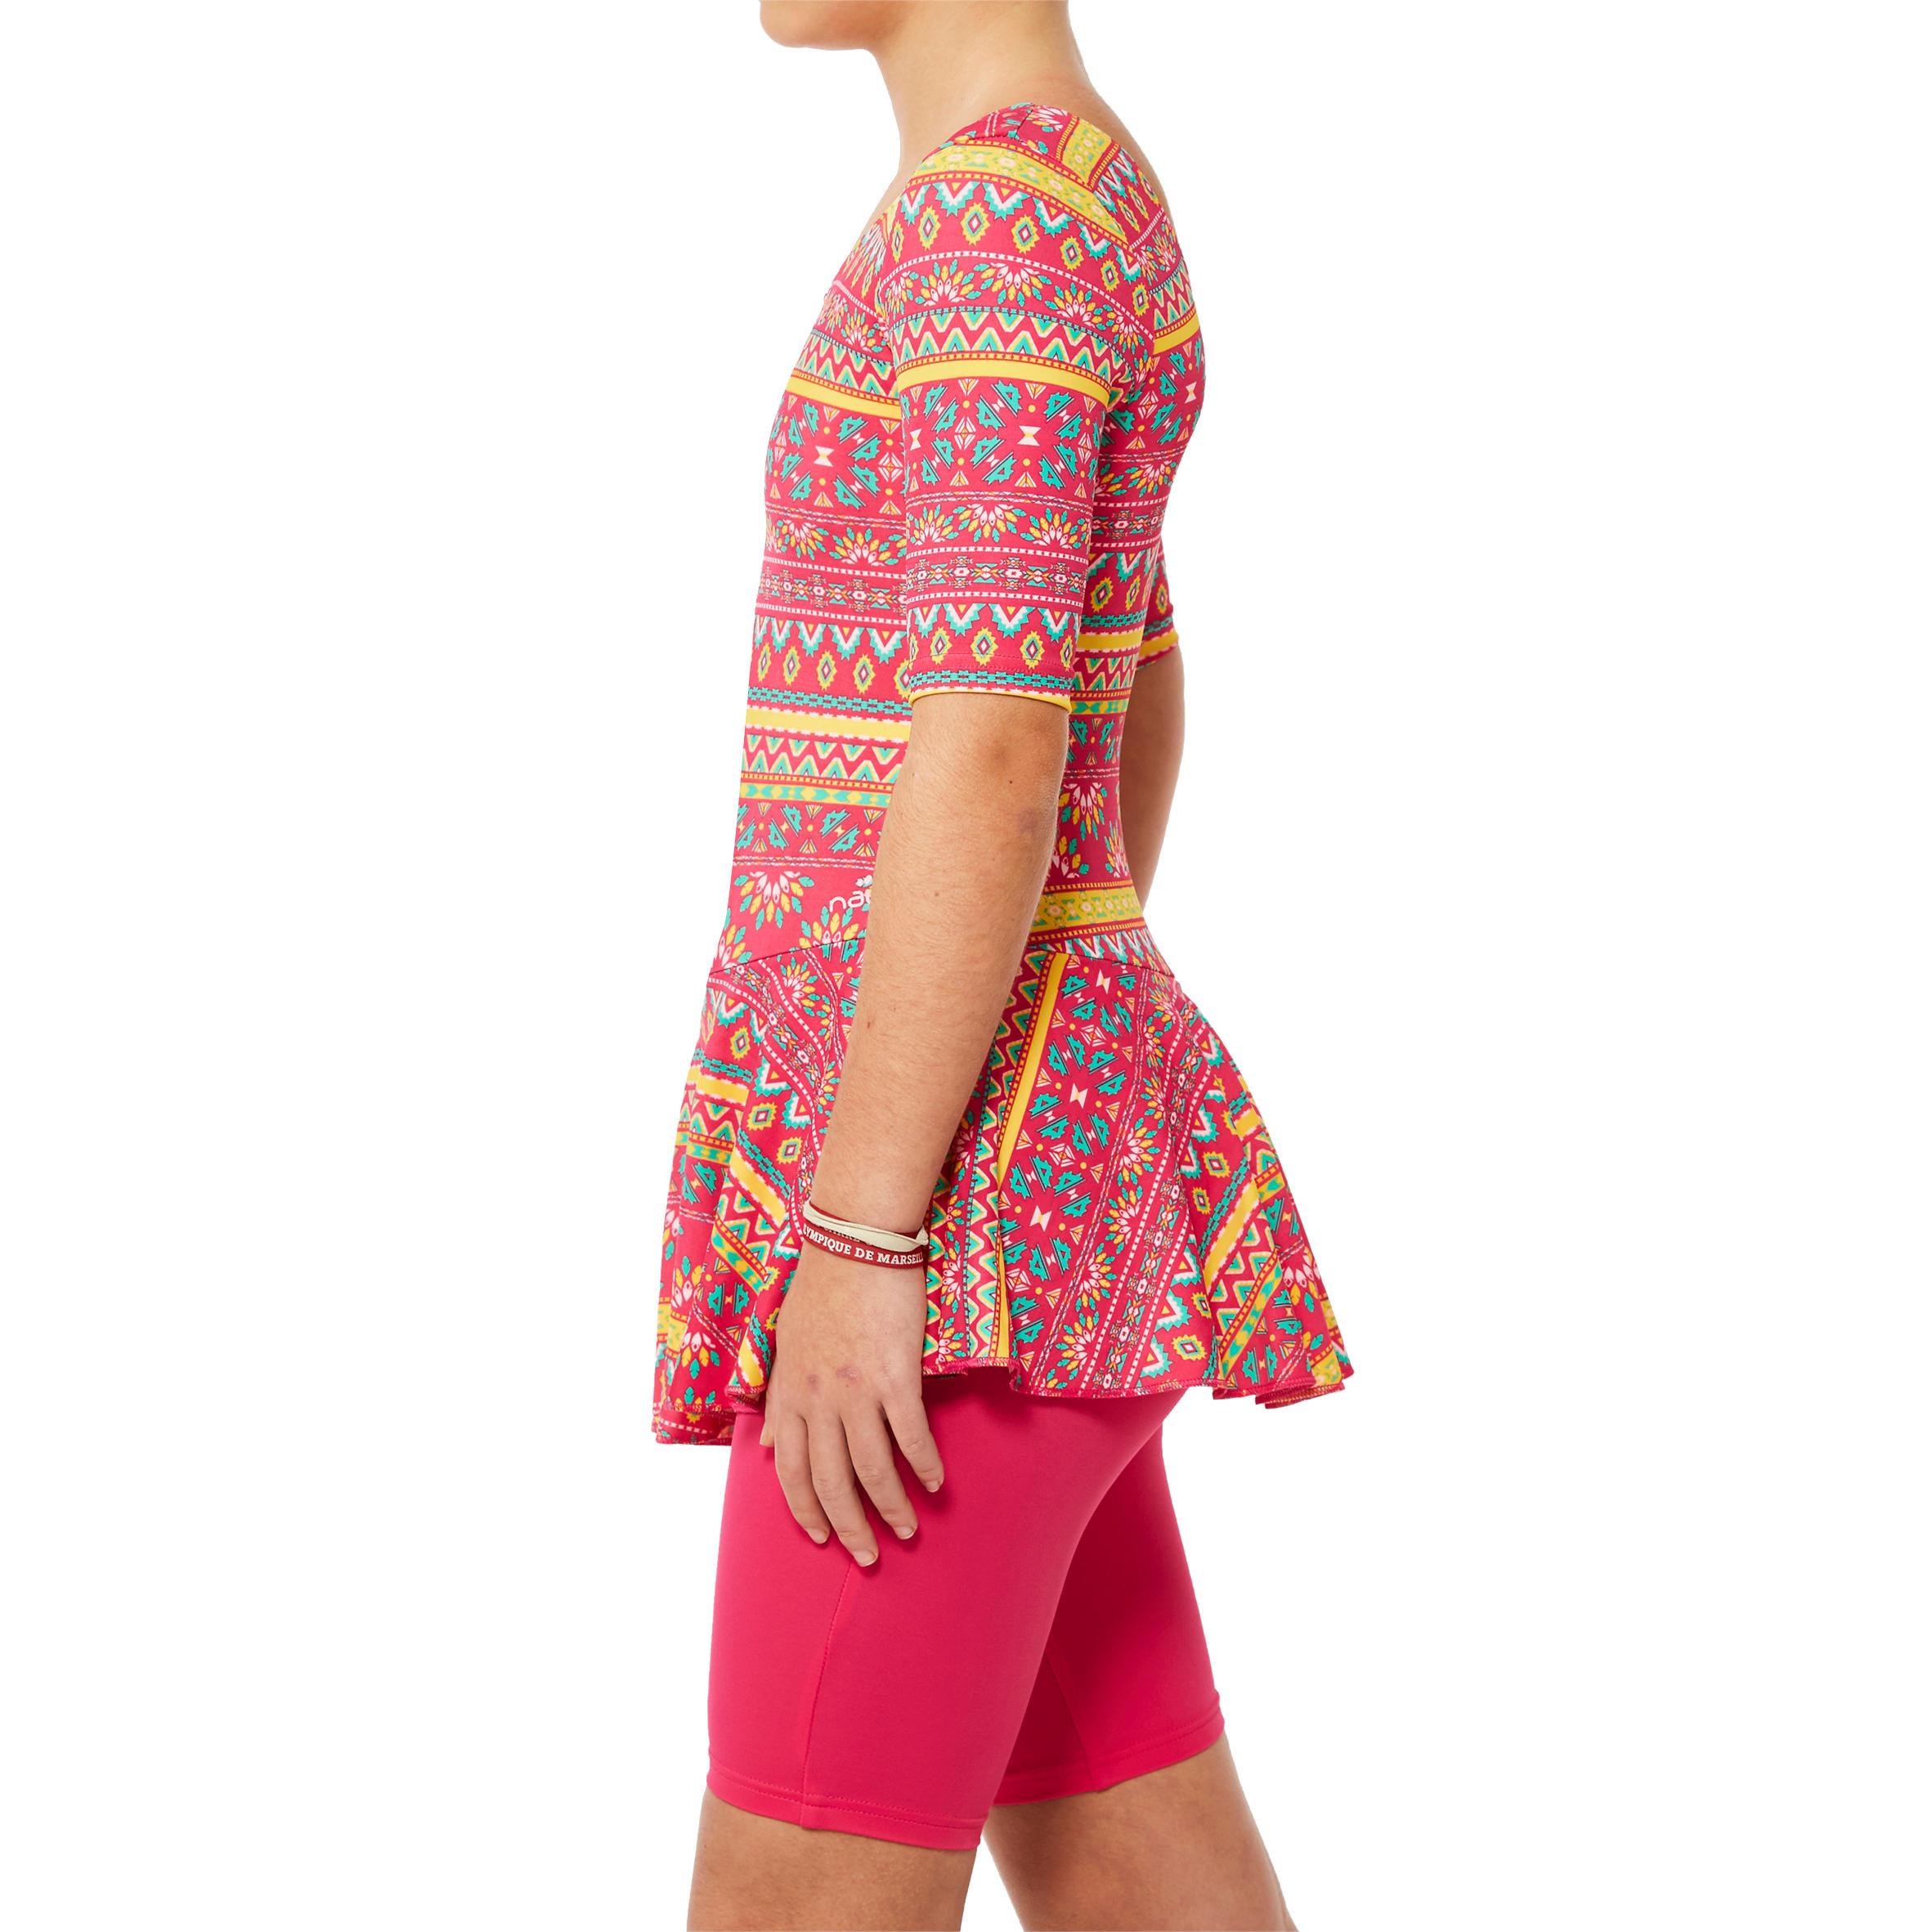 Girl swimming costume audrey jammer- Plum Pink